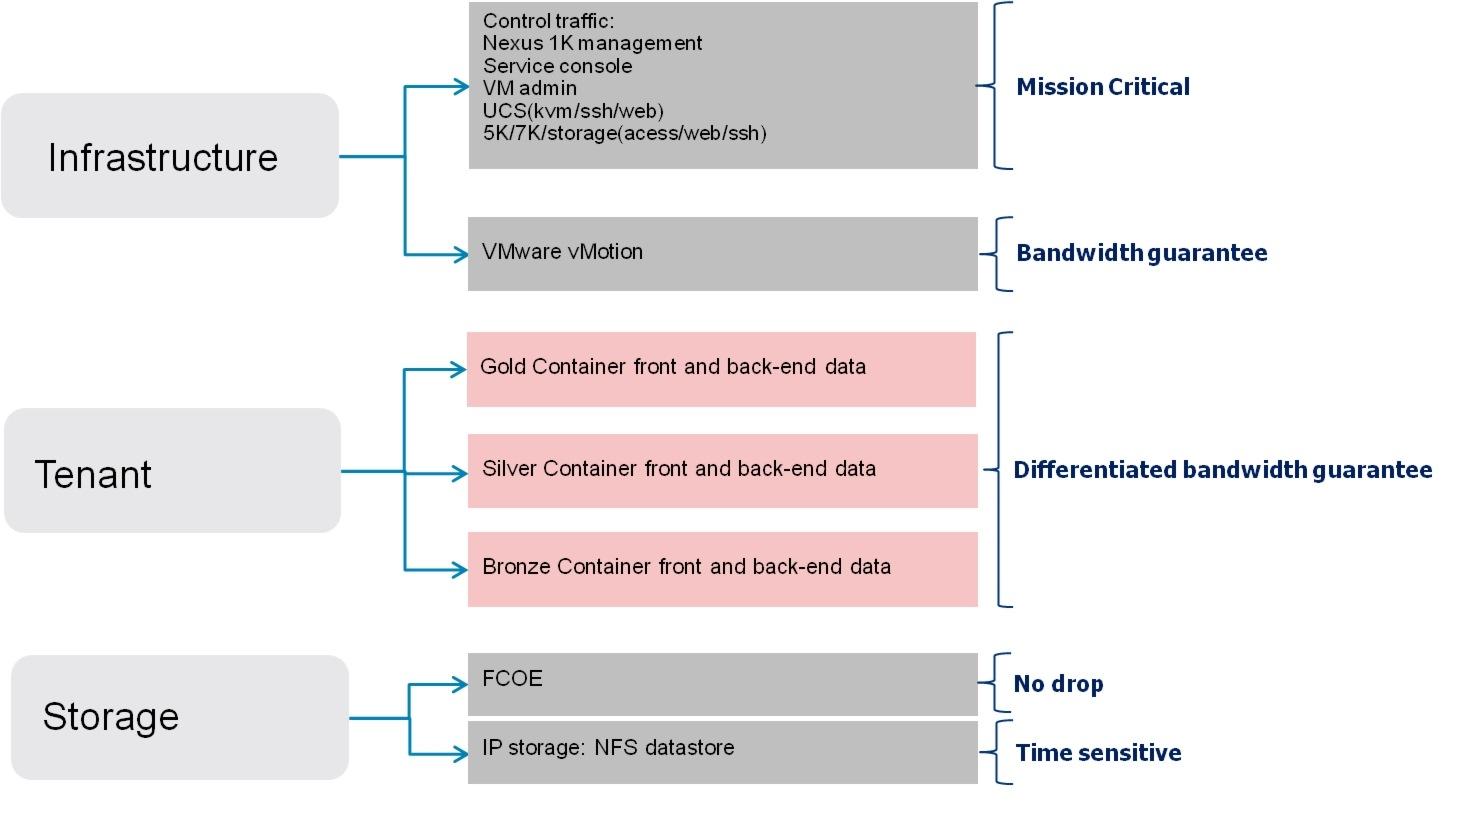 Cisco Virtual Multi Tenant Data Center Design Guide Compact Pod Simple Trafic Light Container Schematic Figure 2 13 Traffic Flow Types